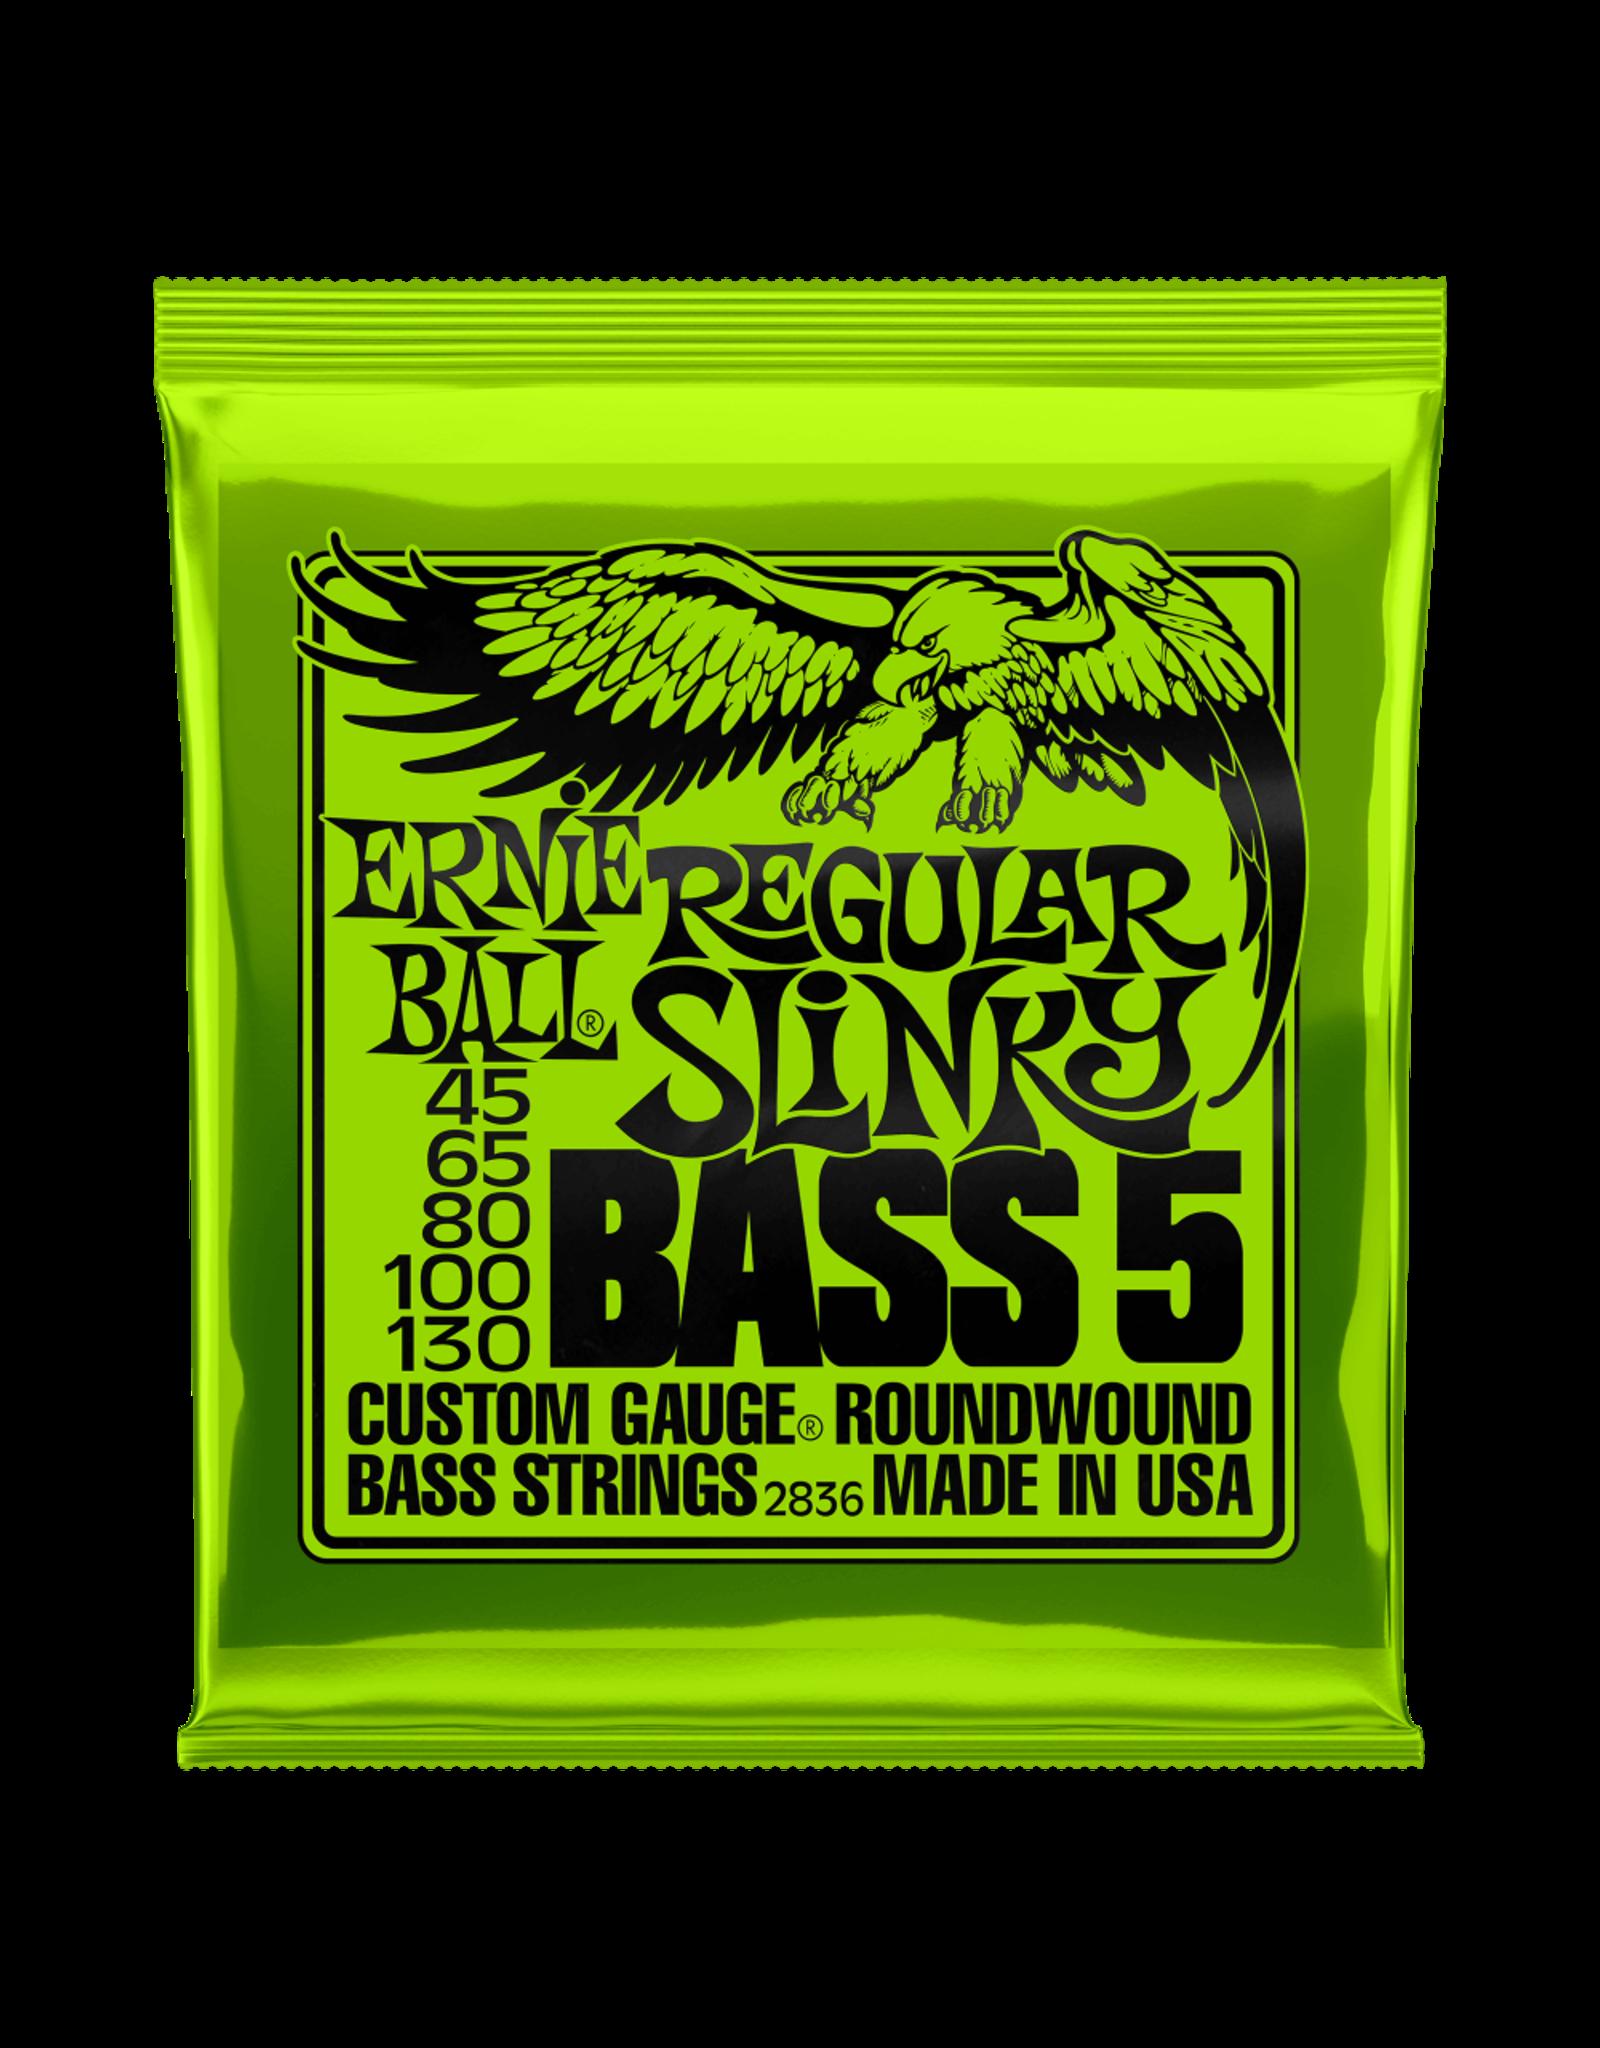 Ernie Ball Ernie Ball 2836 Regular Slinky 5-String Nickel Wound Electric Bass Strings - 45-130 Gauge